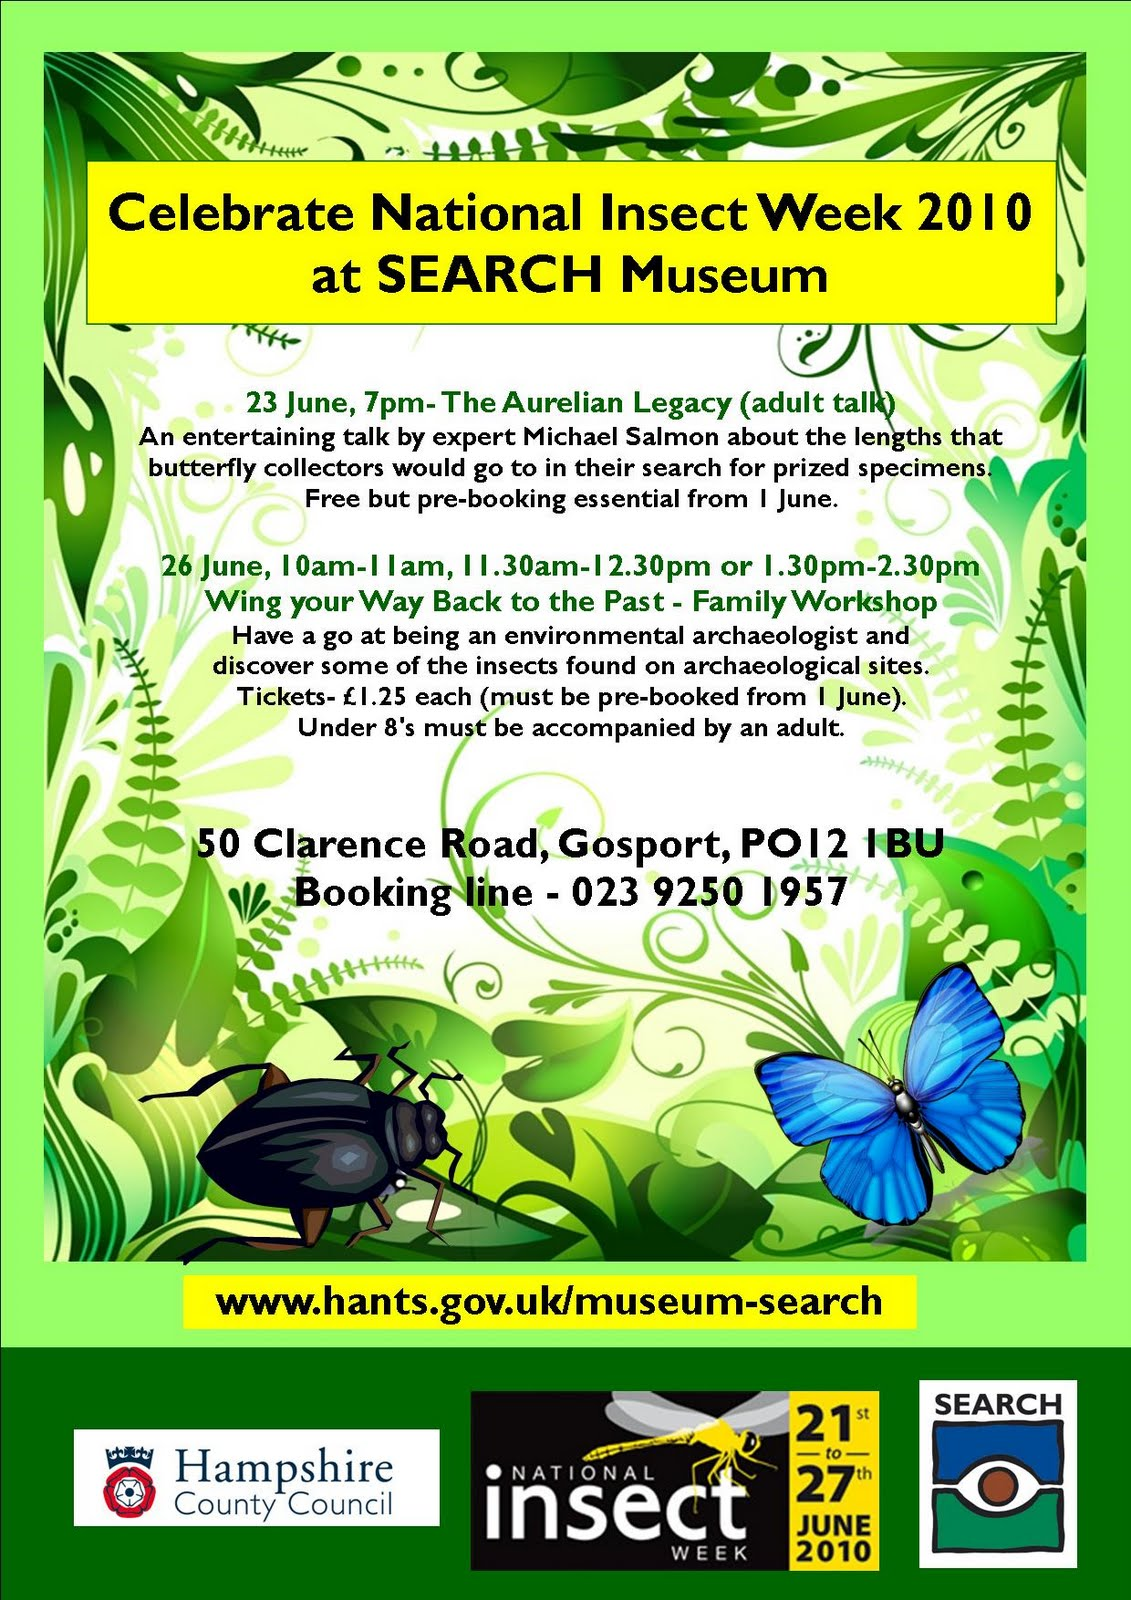 http://4.bp.blogspot.com/_MouMTw6h4ks/TBuWy68_JnI/AAAAAAAABVI/FE0XMvIDKig/s1600/insect+week.jpg